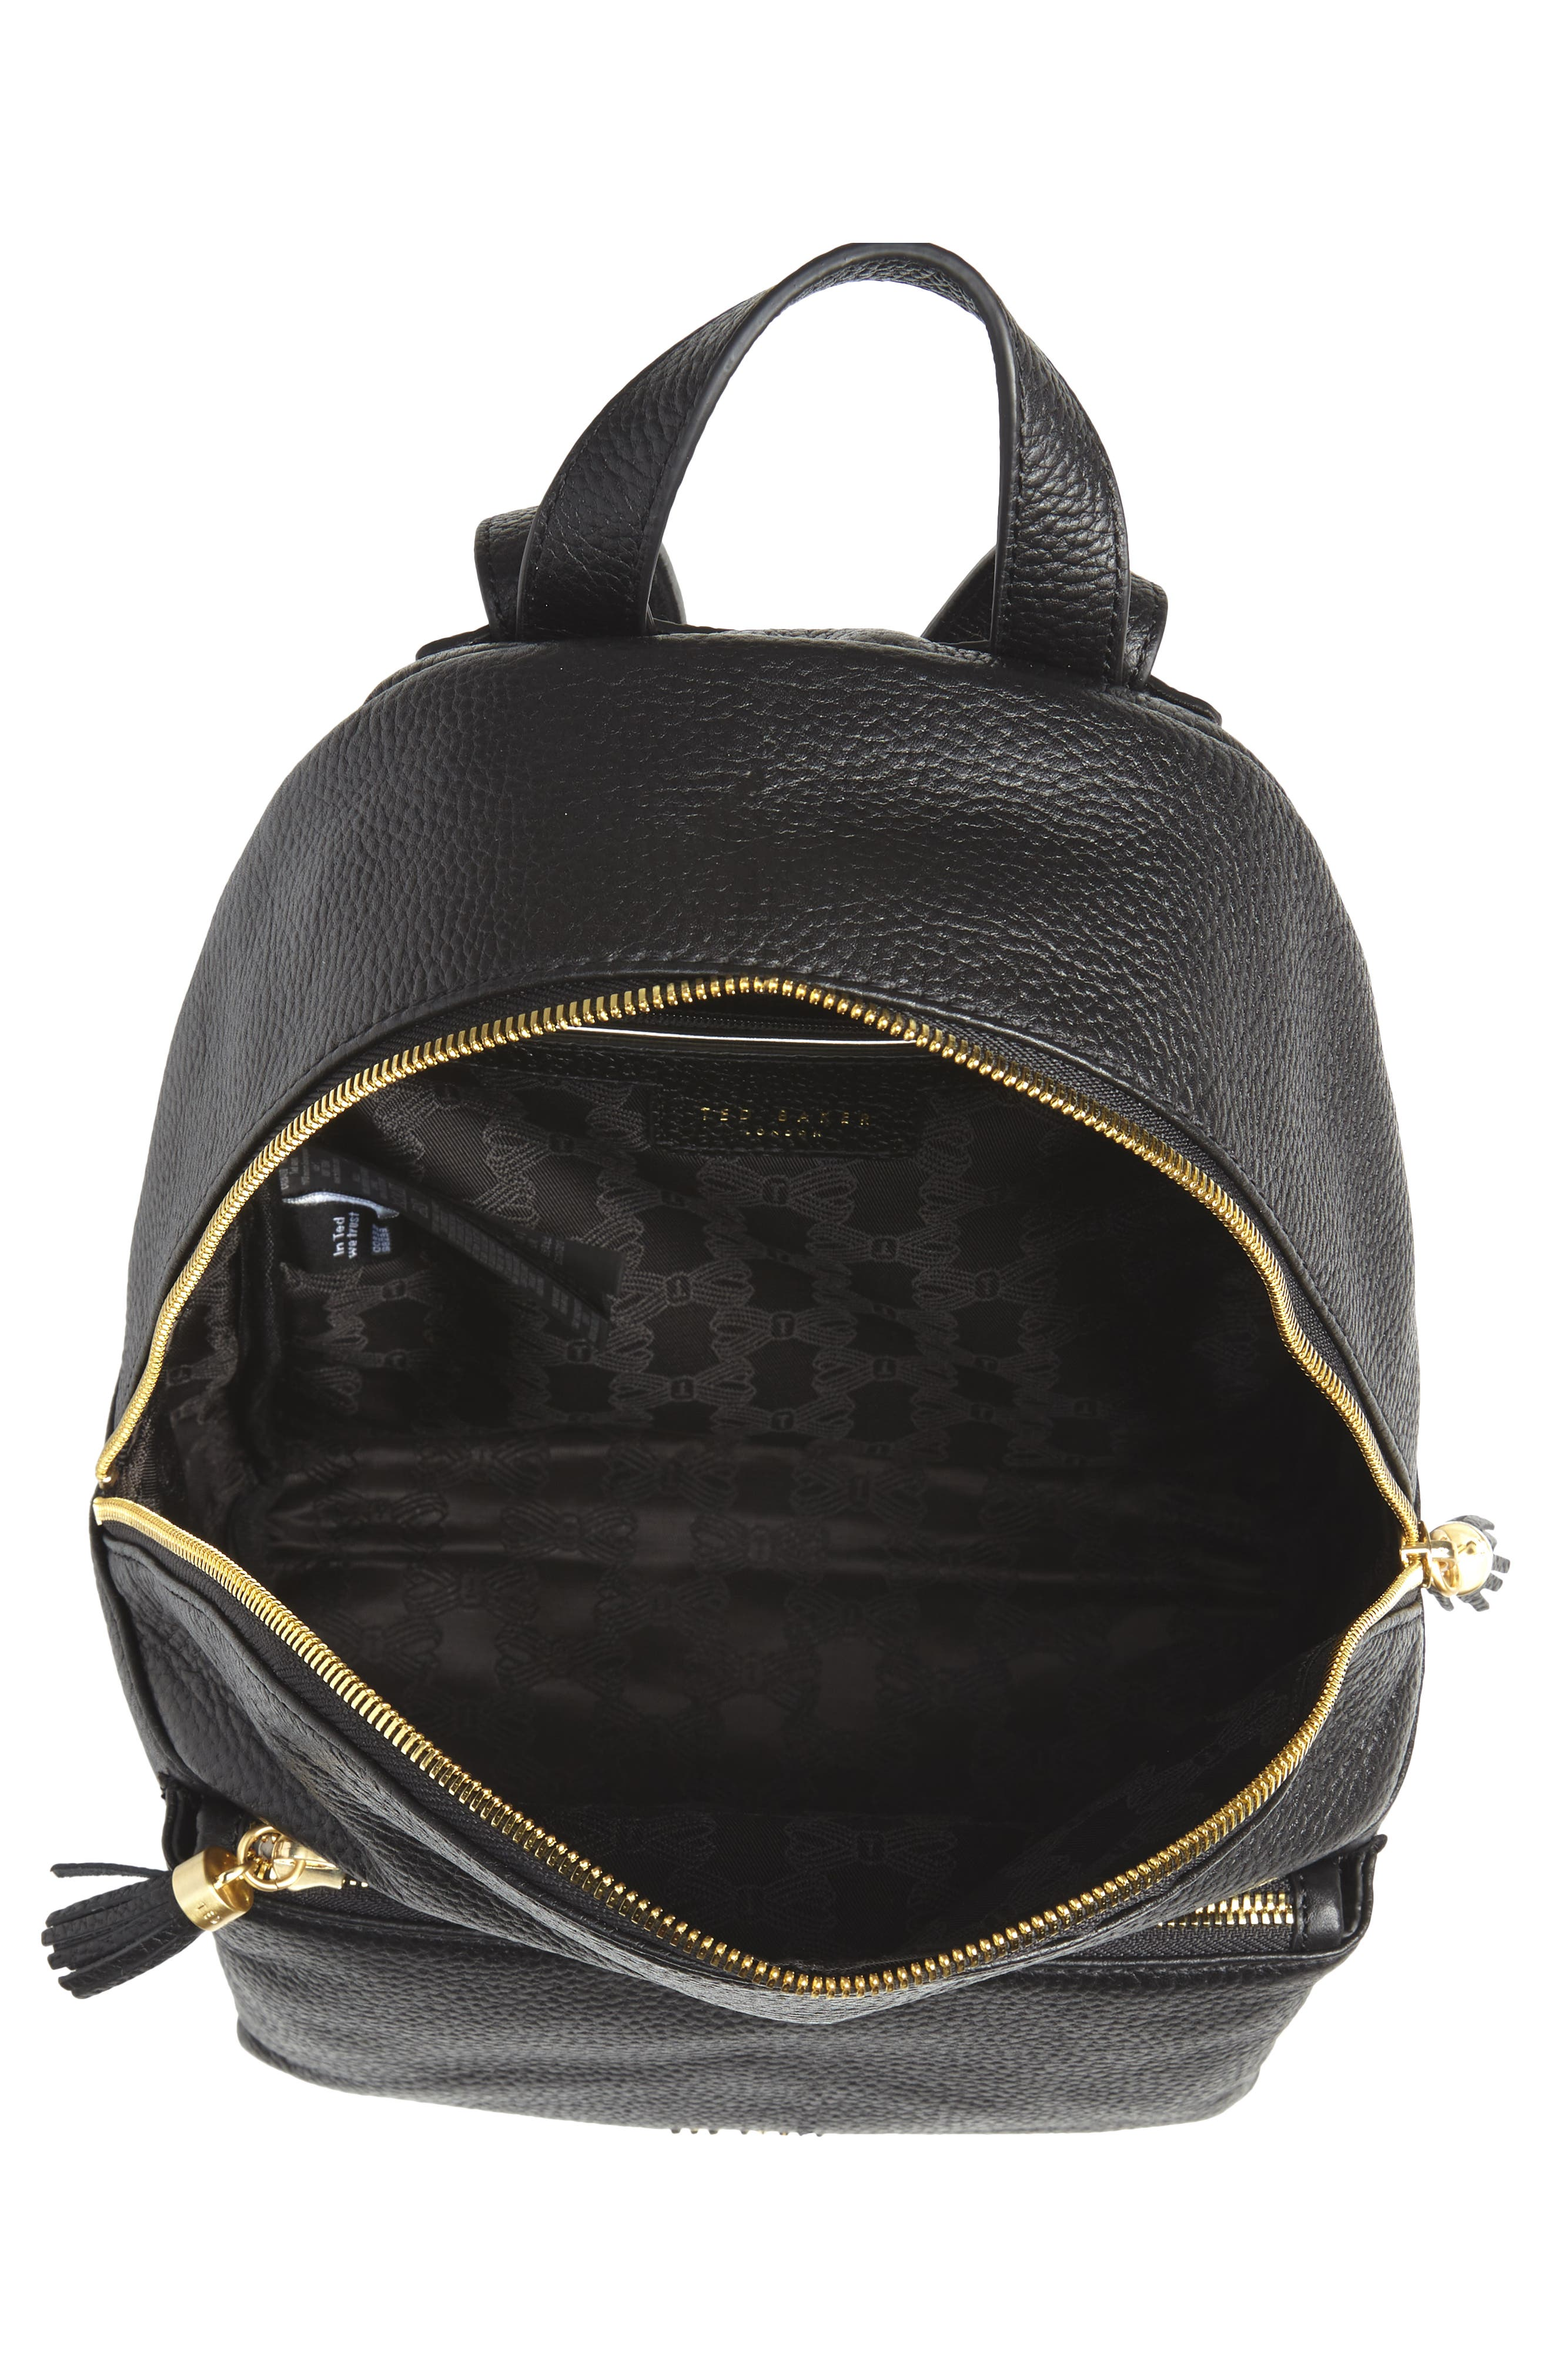 TED BAKER LONDON,                             Leather Backpack,                             Alternate thumbnail 4, color,                             001